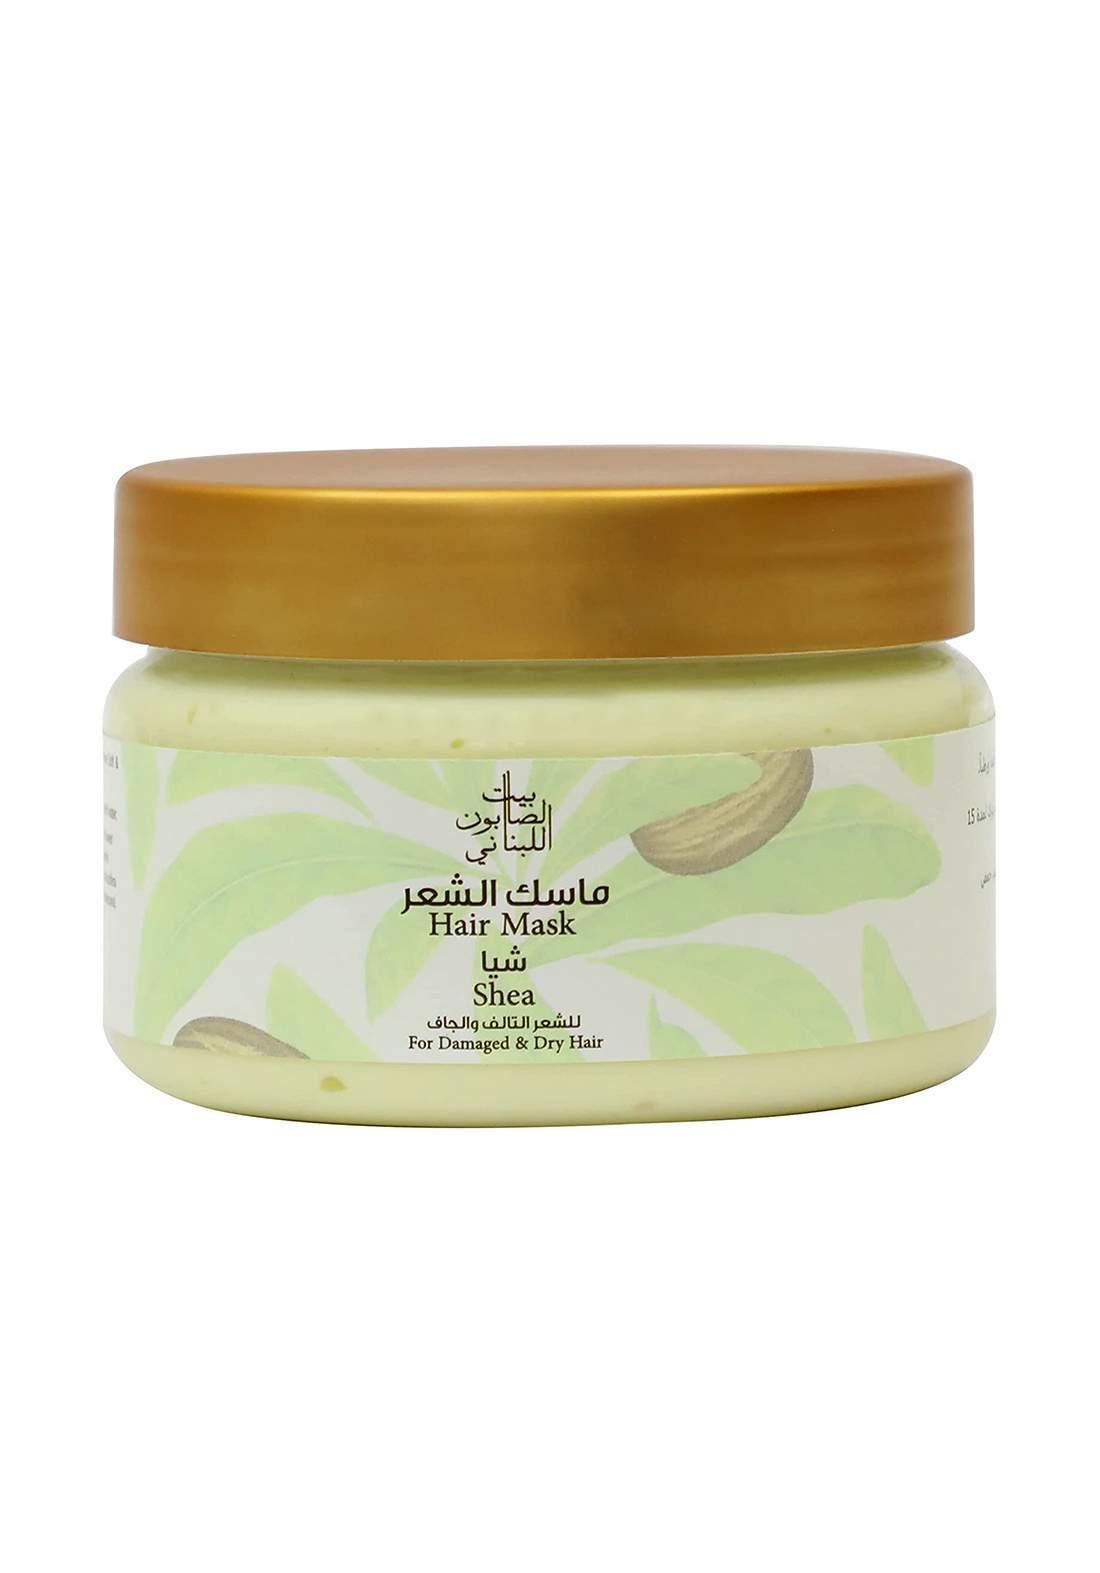 Bayt Alsaboun Alloubnani-317453 Hair Mask Shea 300g ماسك للشعر